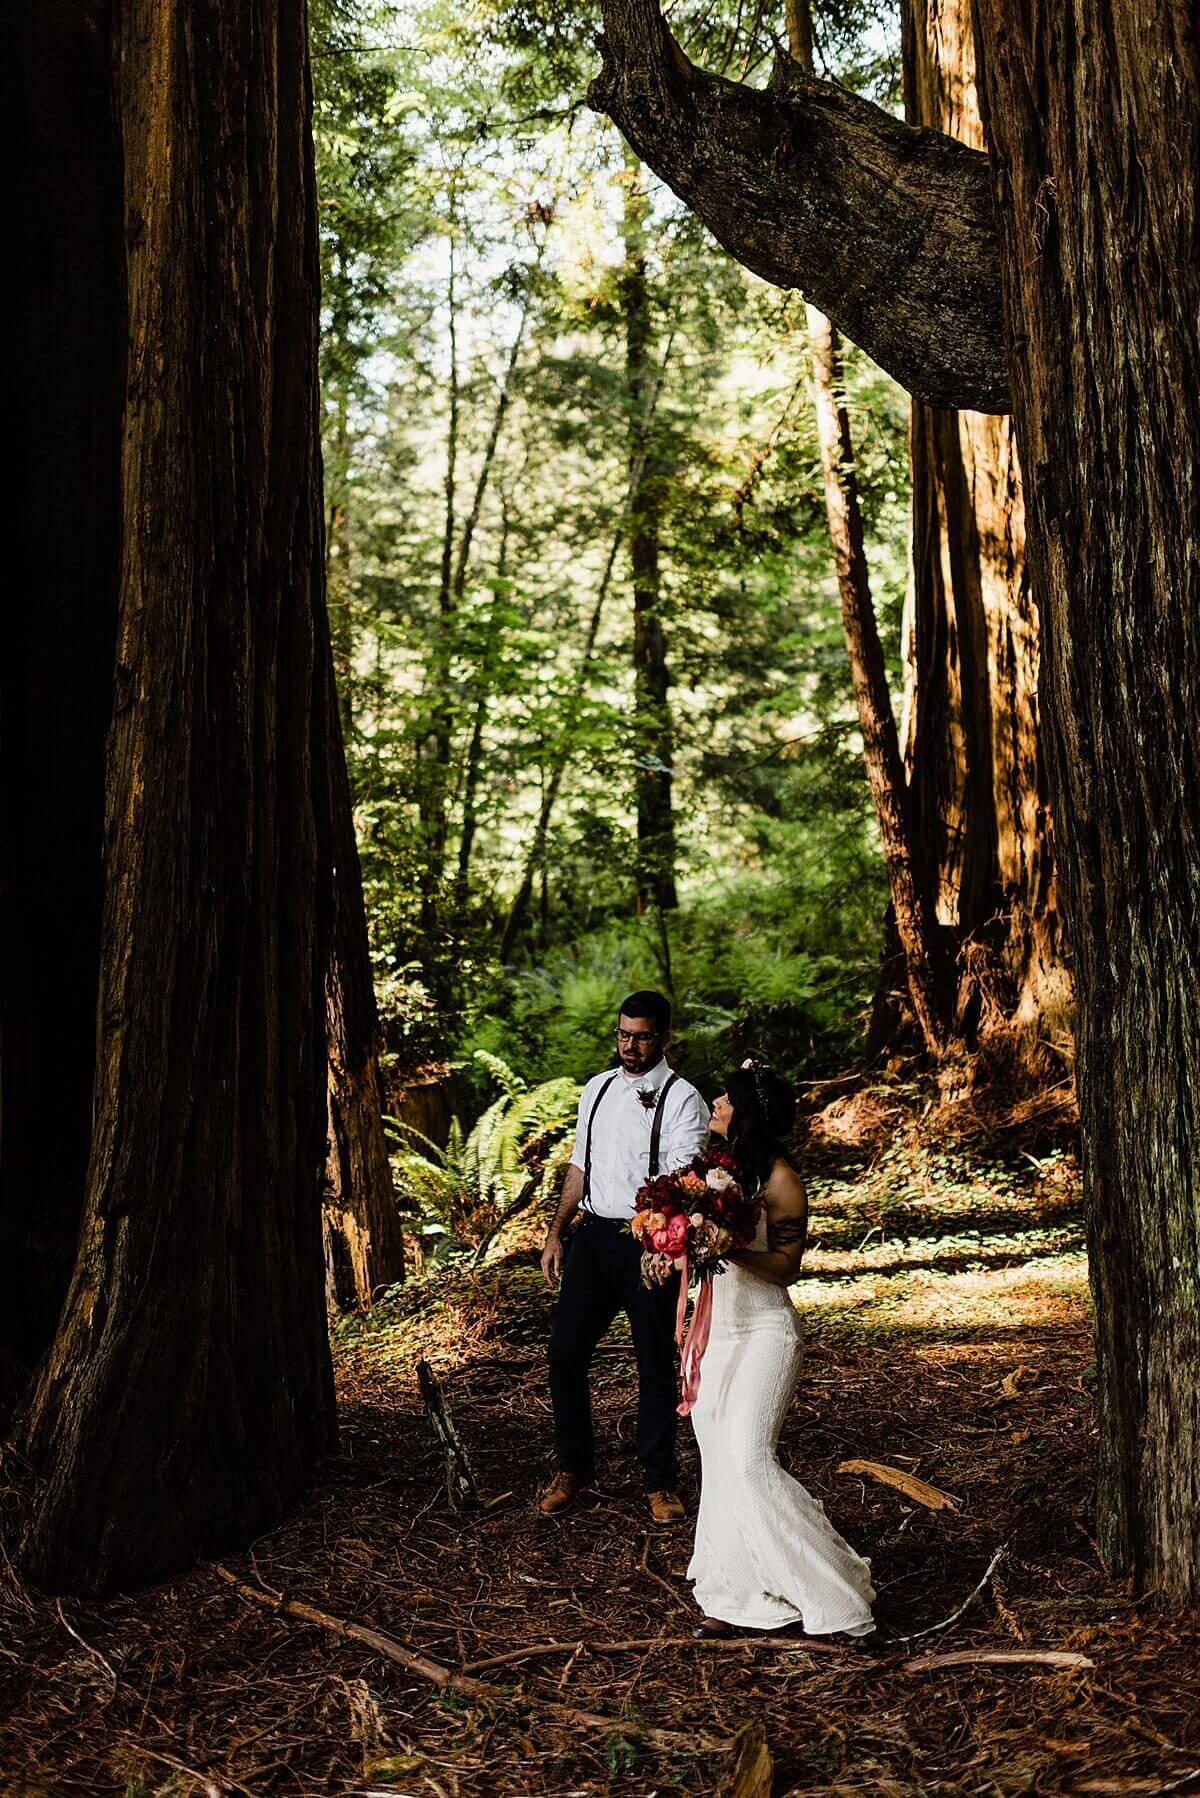 Allison-Brooks-Jedediah-Smiith-Redwoods-Adventure-Elopement-Wedding-S-Photography-Blog_0003.jpg